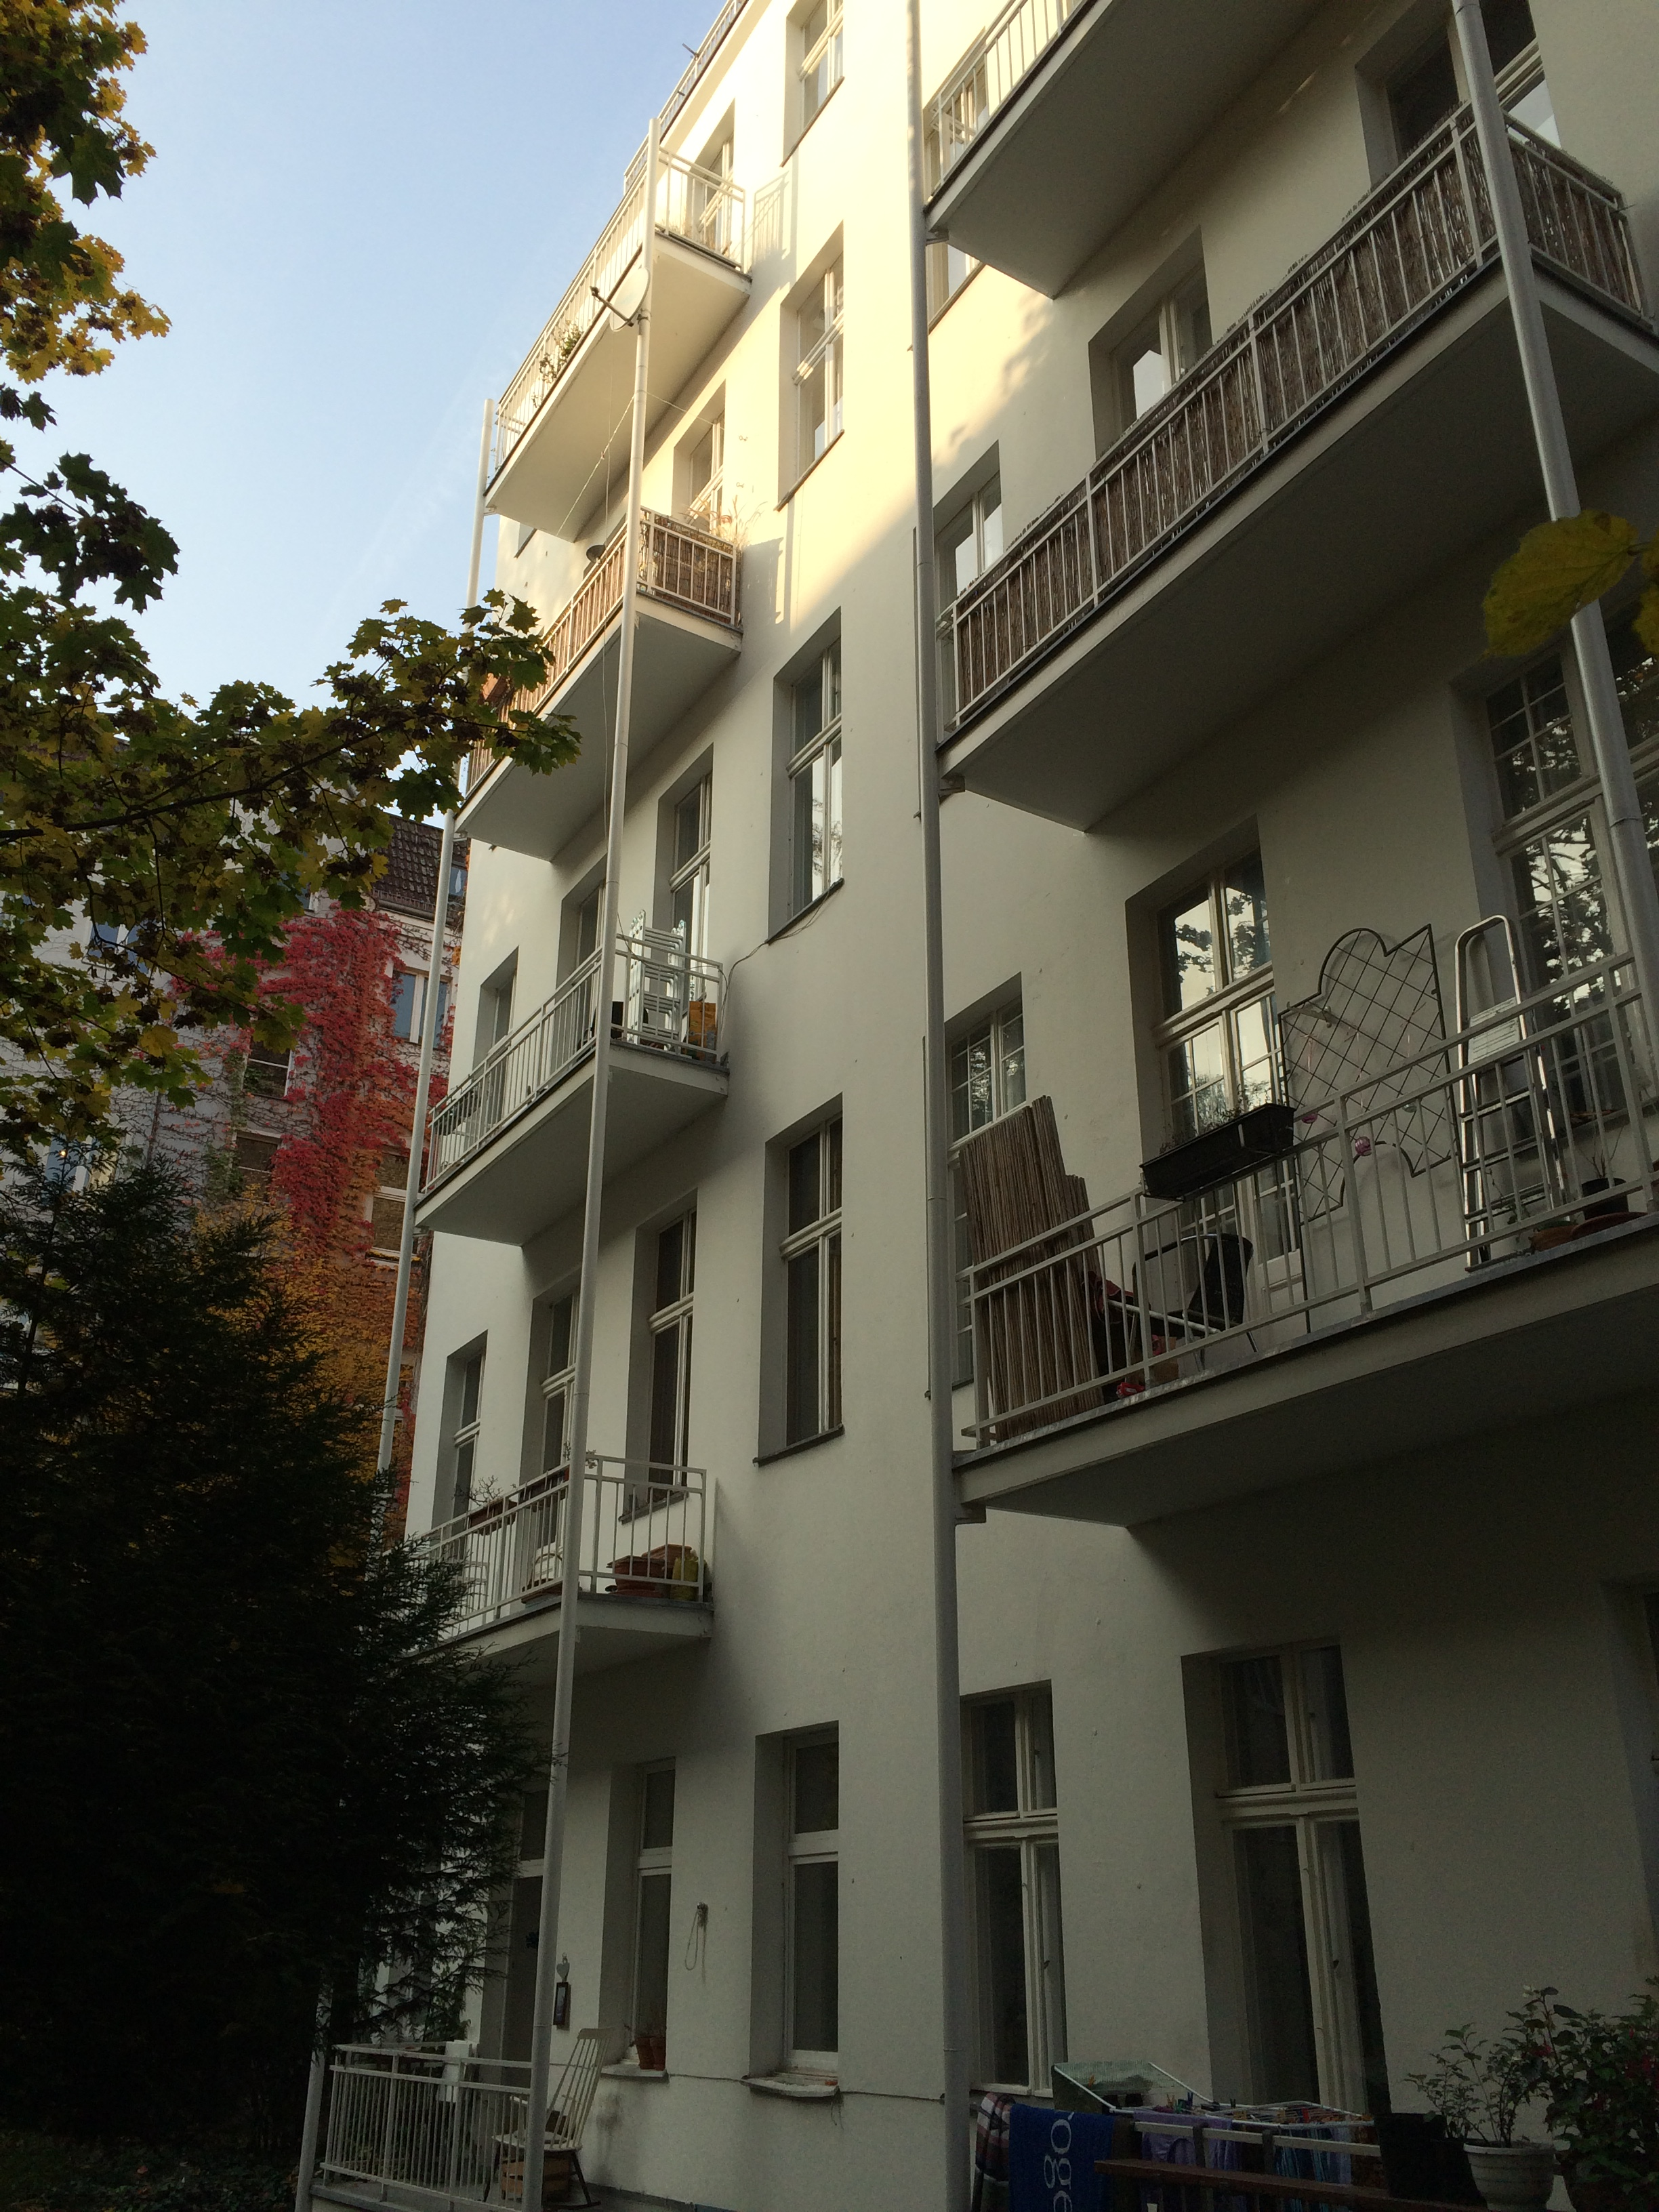 Charlottenburg, Berlin